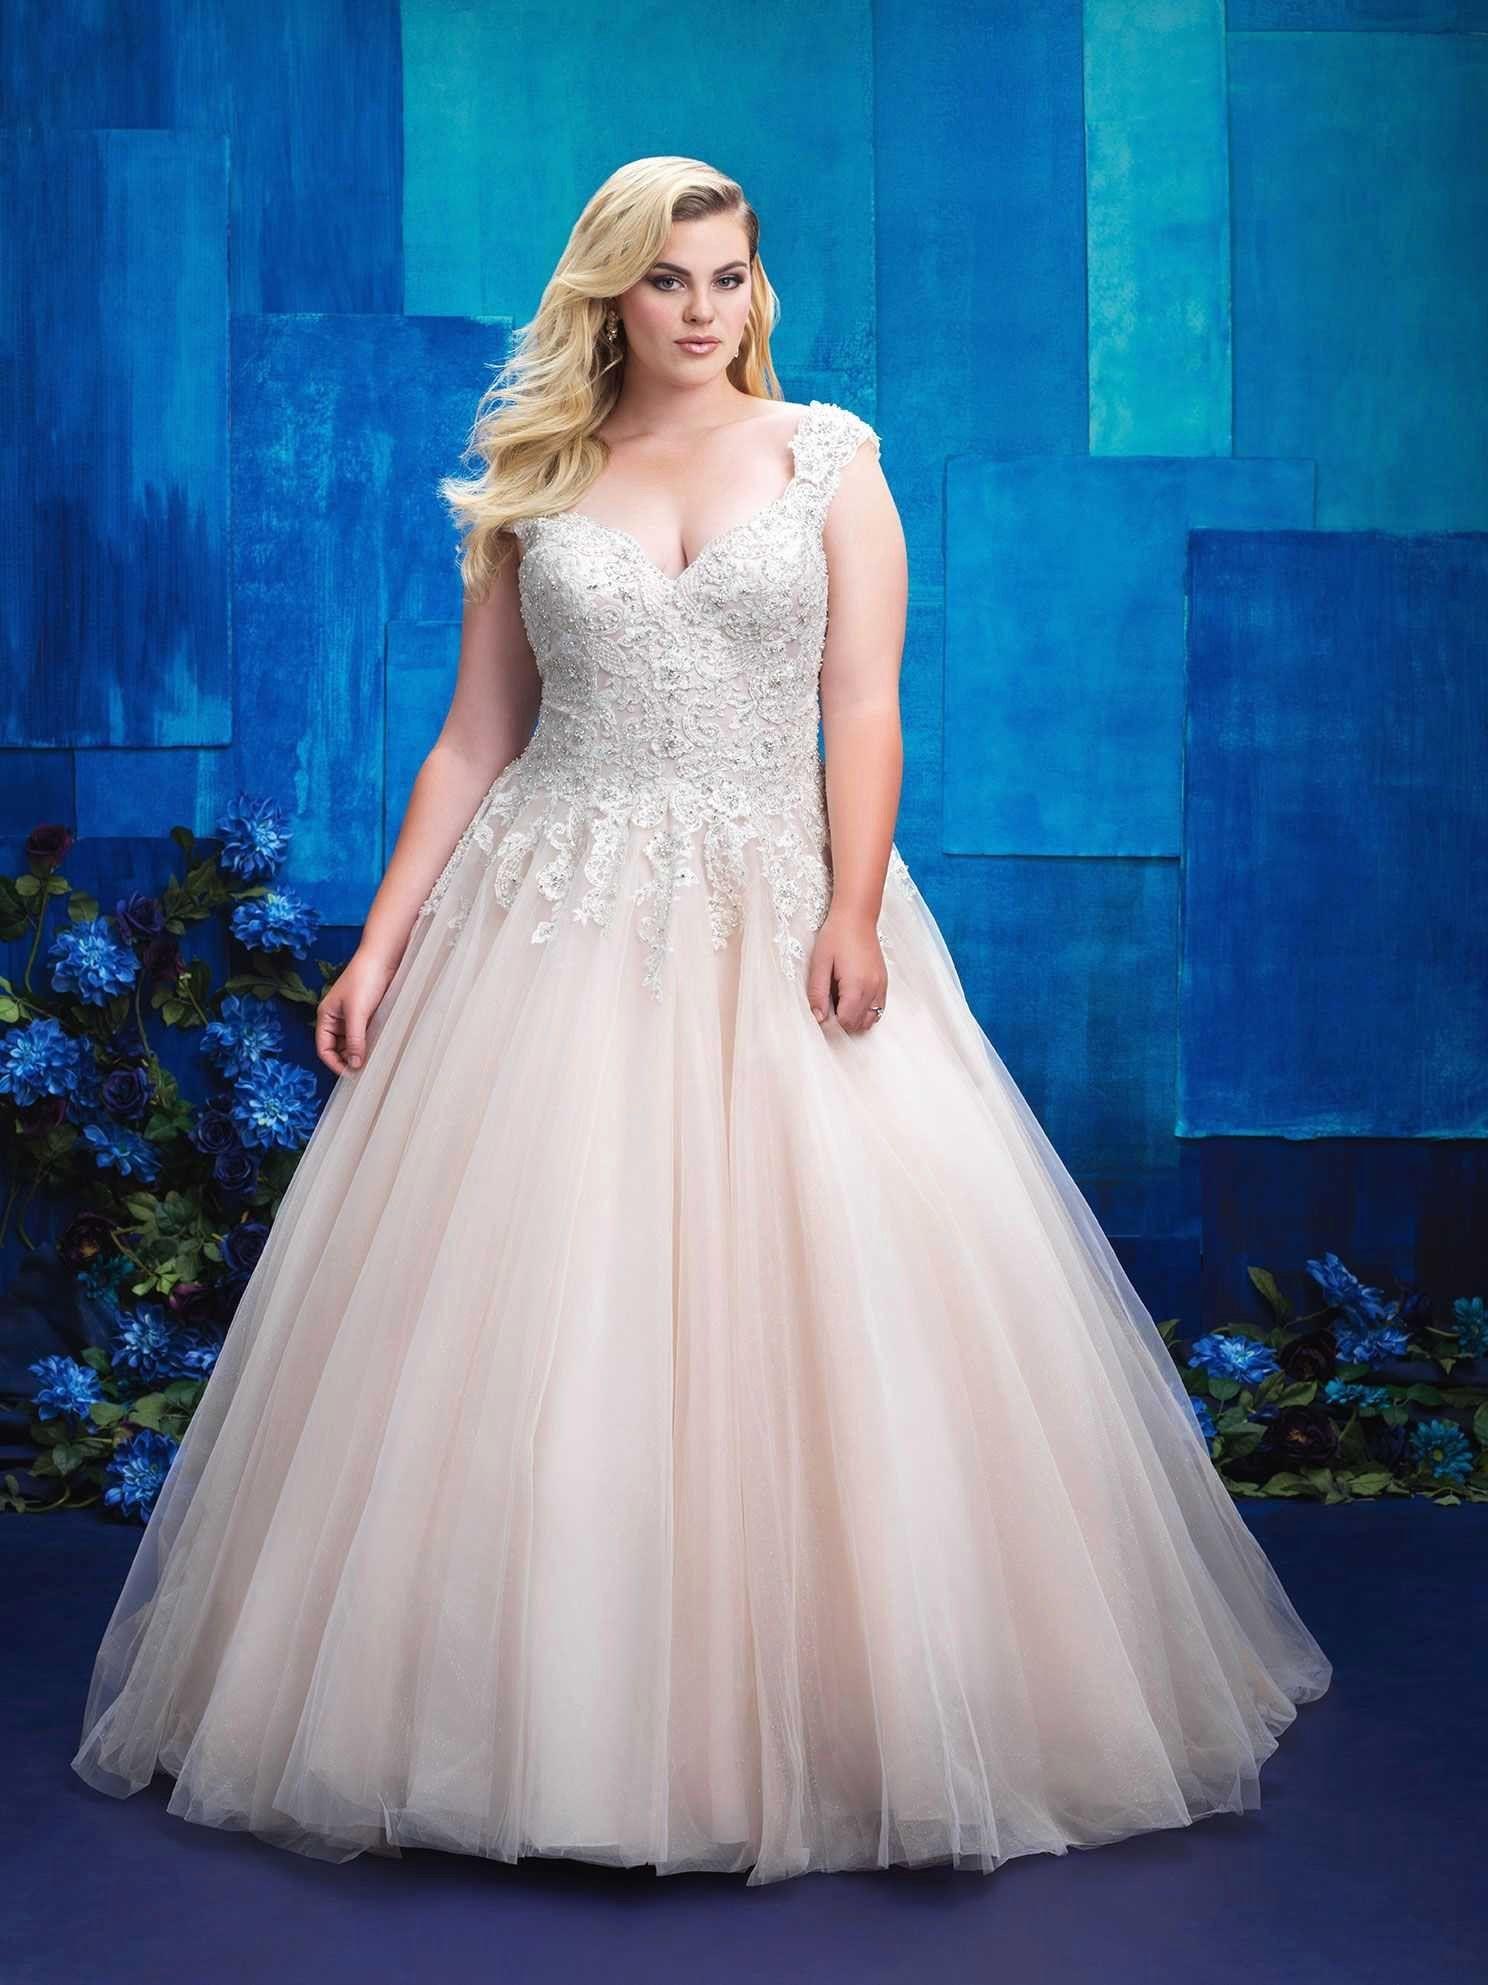 Wedding Dress Shop In Birmingham Lovely Lace Sleeves Wedding Gown Fresh 486 Best Long Sle In 2020 Plus Size Wedding Gowns Wedding Dresses Plus Size Wedding Dress Store